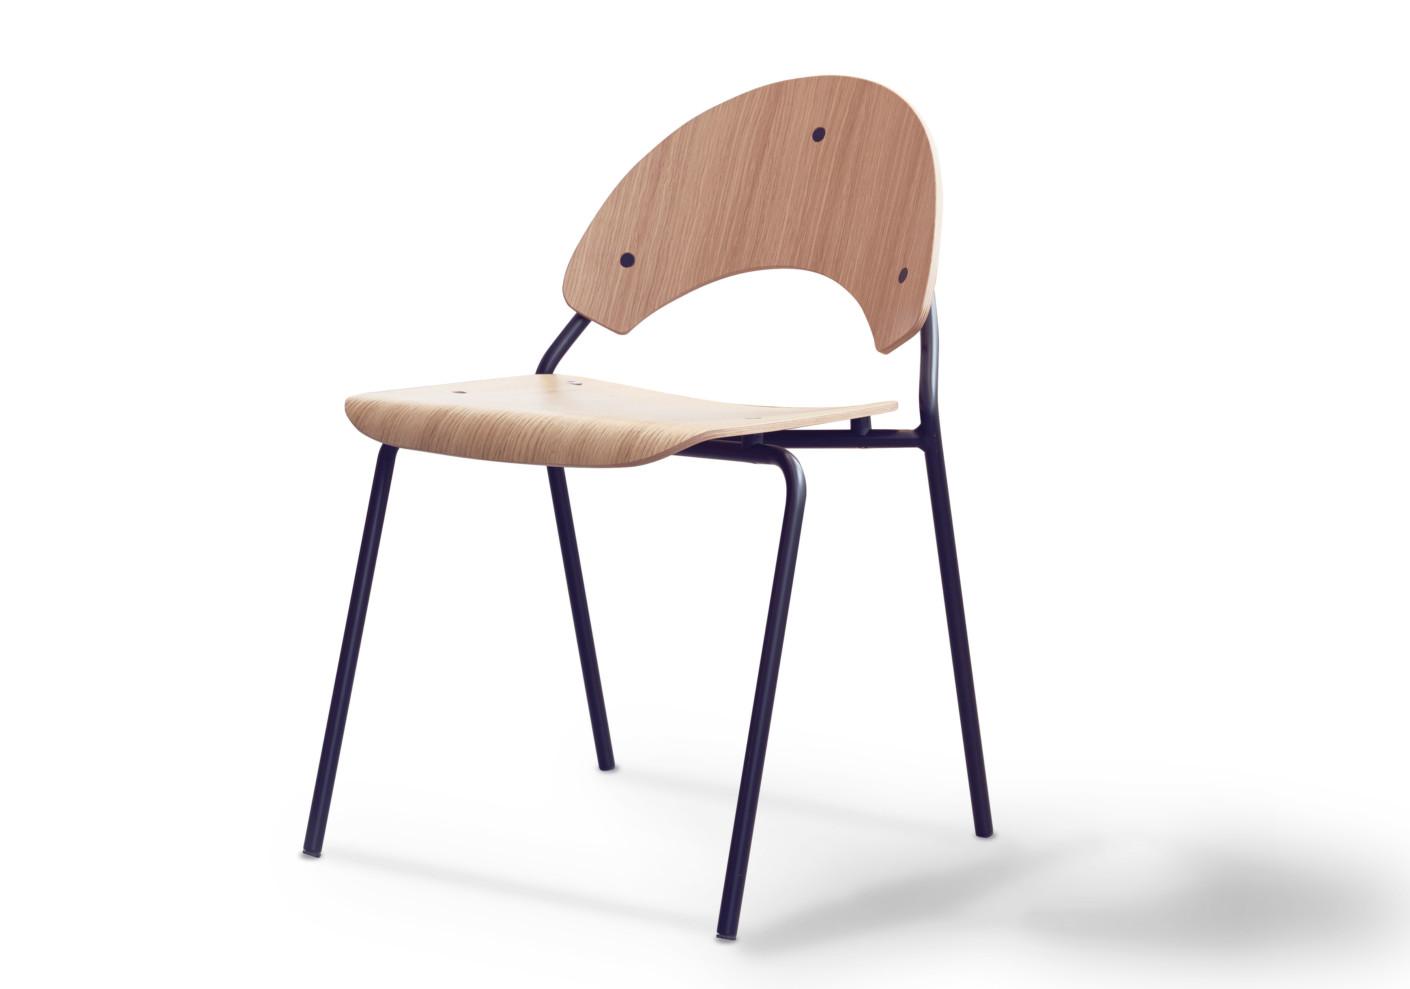 timeless design frog chair by herbert hirche for lampert. Black Bedroom Furniture Sets. Home Design Ideas